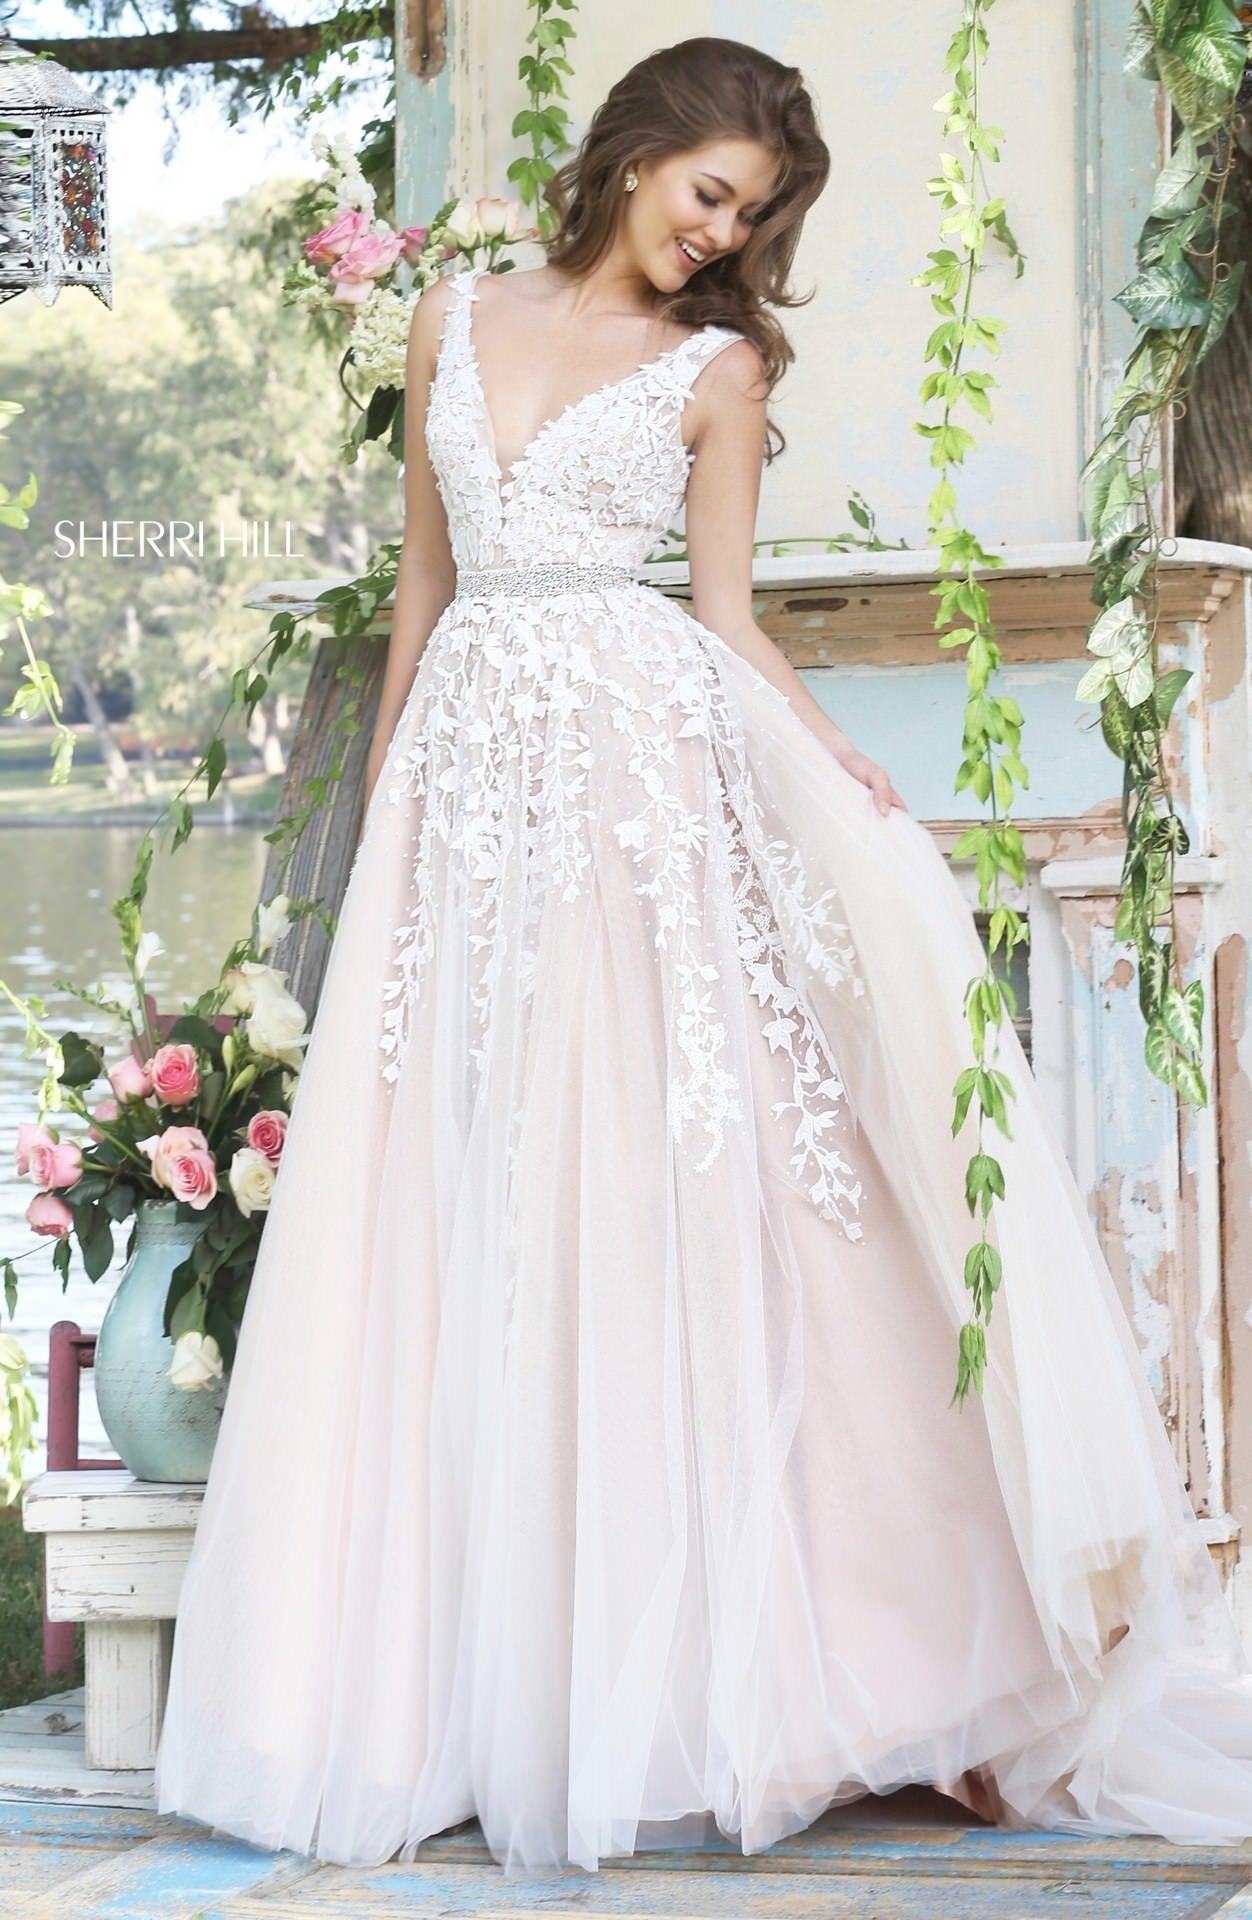 cbedf45c6633 11335 Sherri Hill | Cata is the bomb! | Wedding dresses, Dresses ...